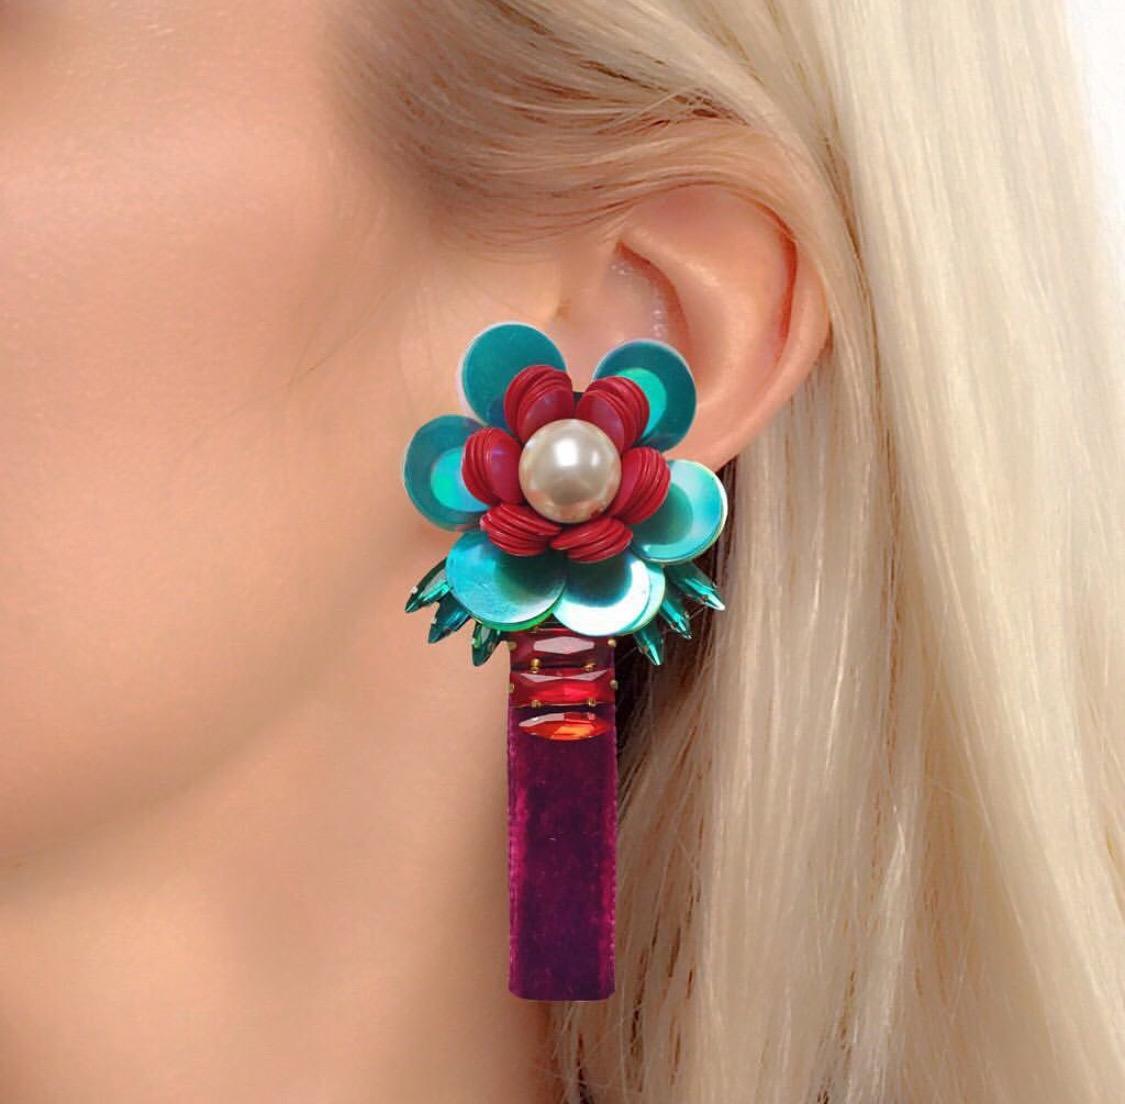 Bloom luxury earrings